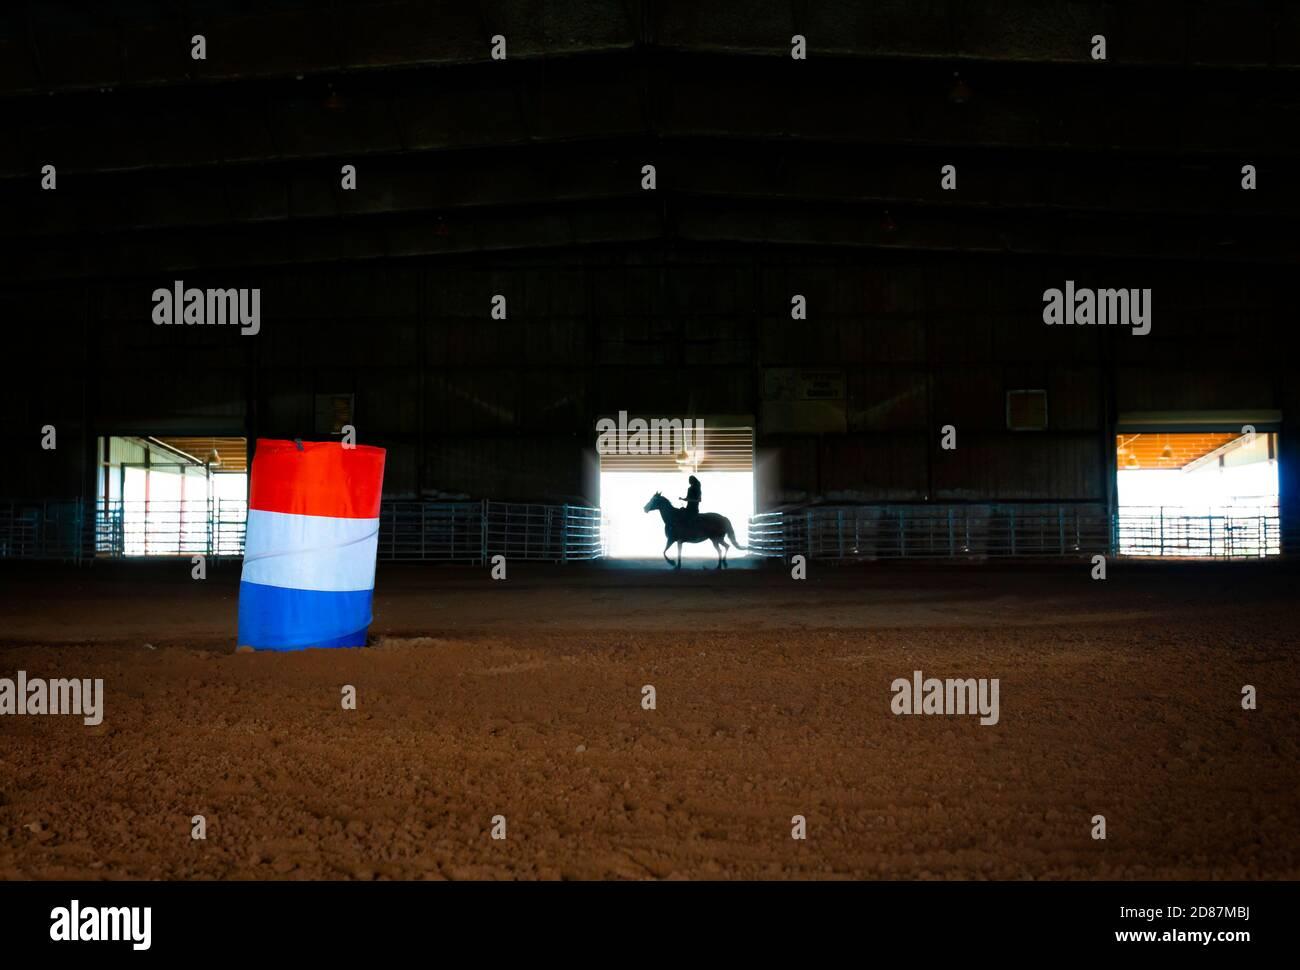 Woman On Horseback Silhouette In Barrel Racing Arena Stock Photo Alamy